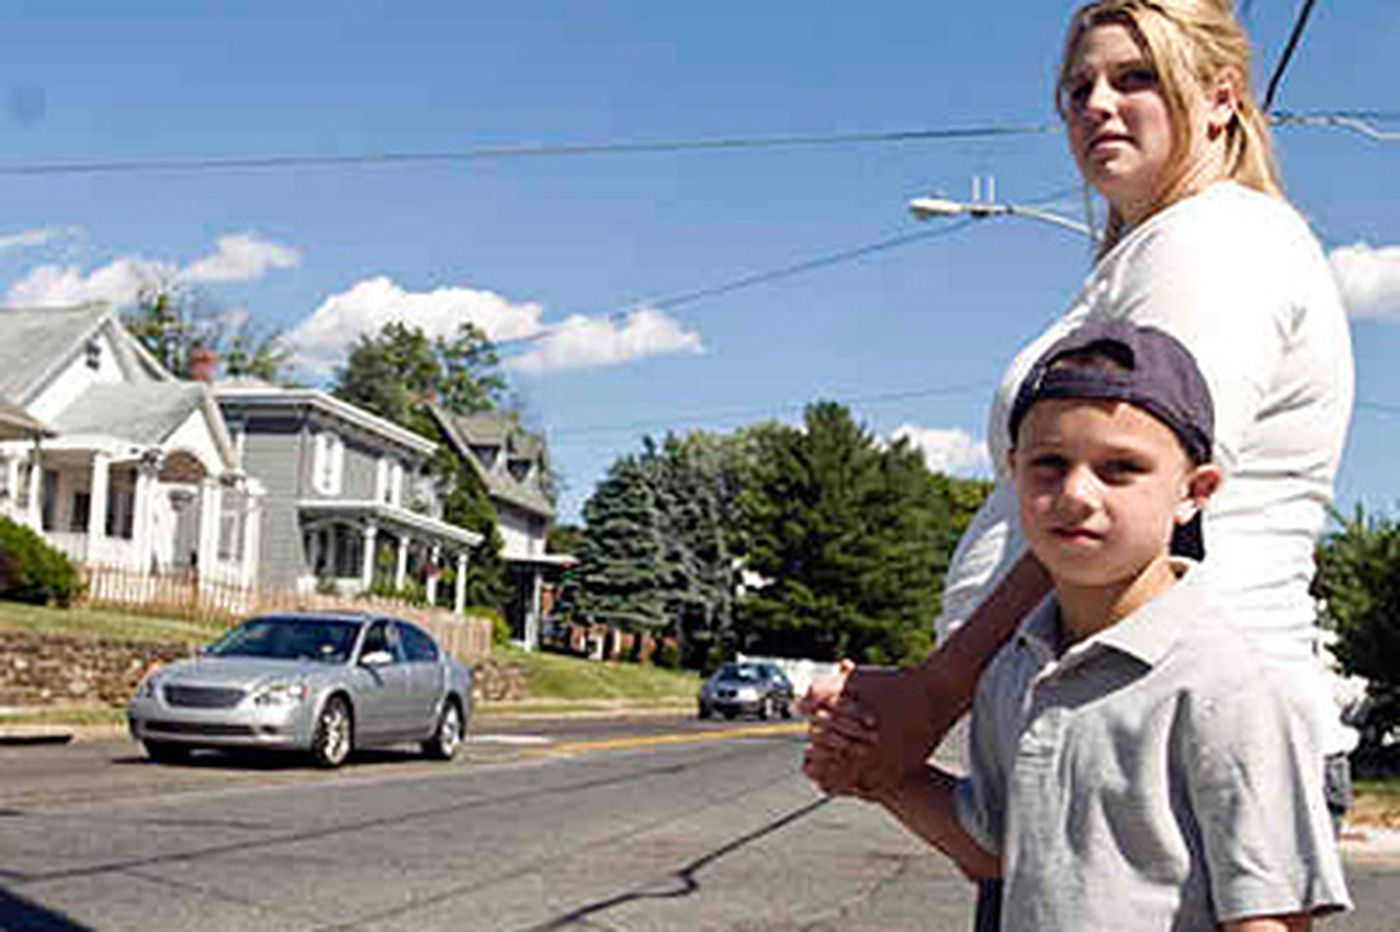 Kindergartner missing from school had walked home